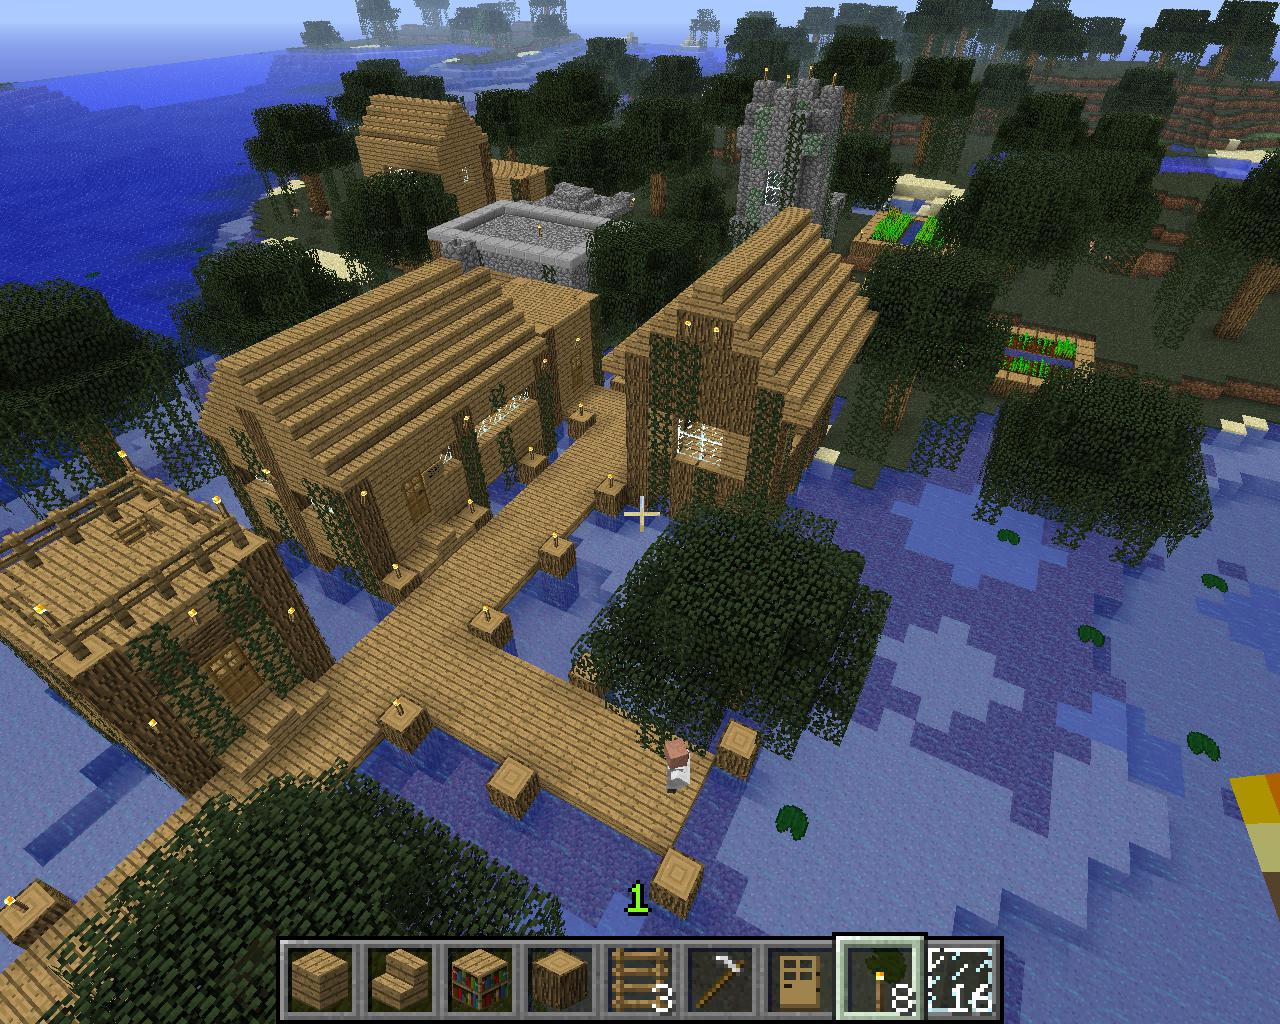 Minecraft screenshots - swamp village 1 by falcon01